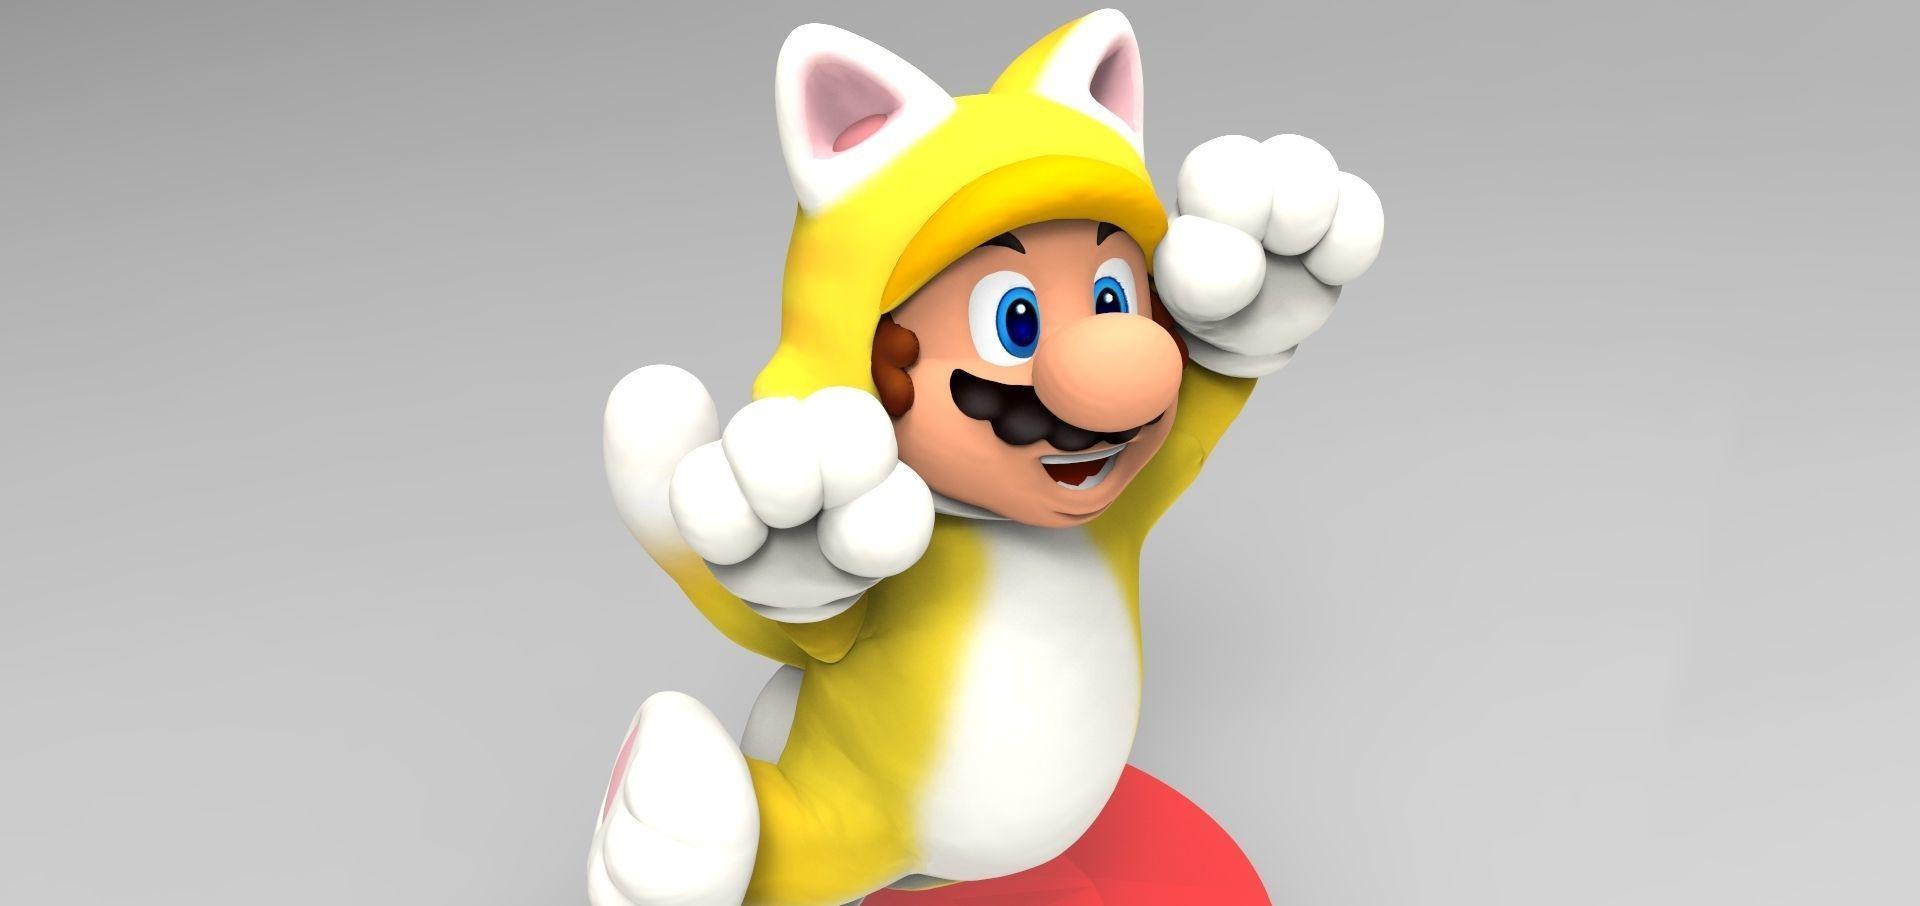 Cat Mario Custom Amiibo